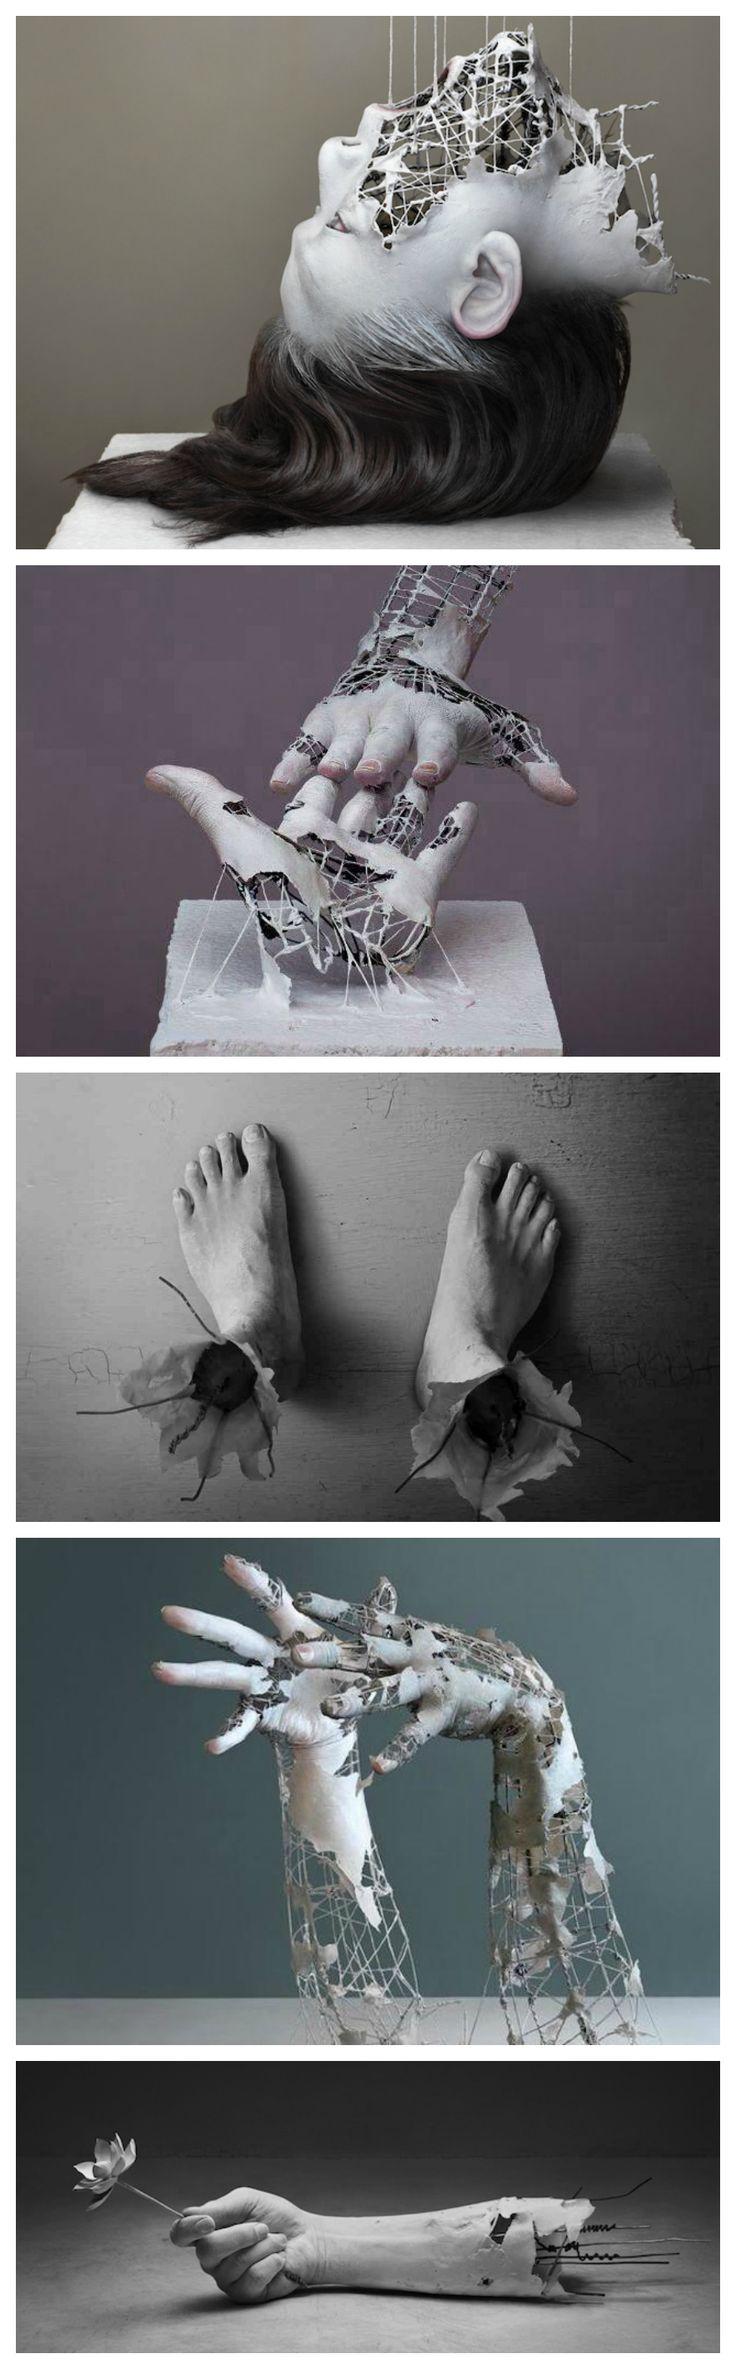 Yuichi Ikehata, surreal human body extremities sculpture